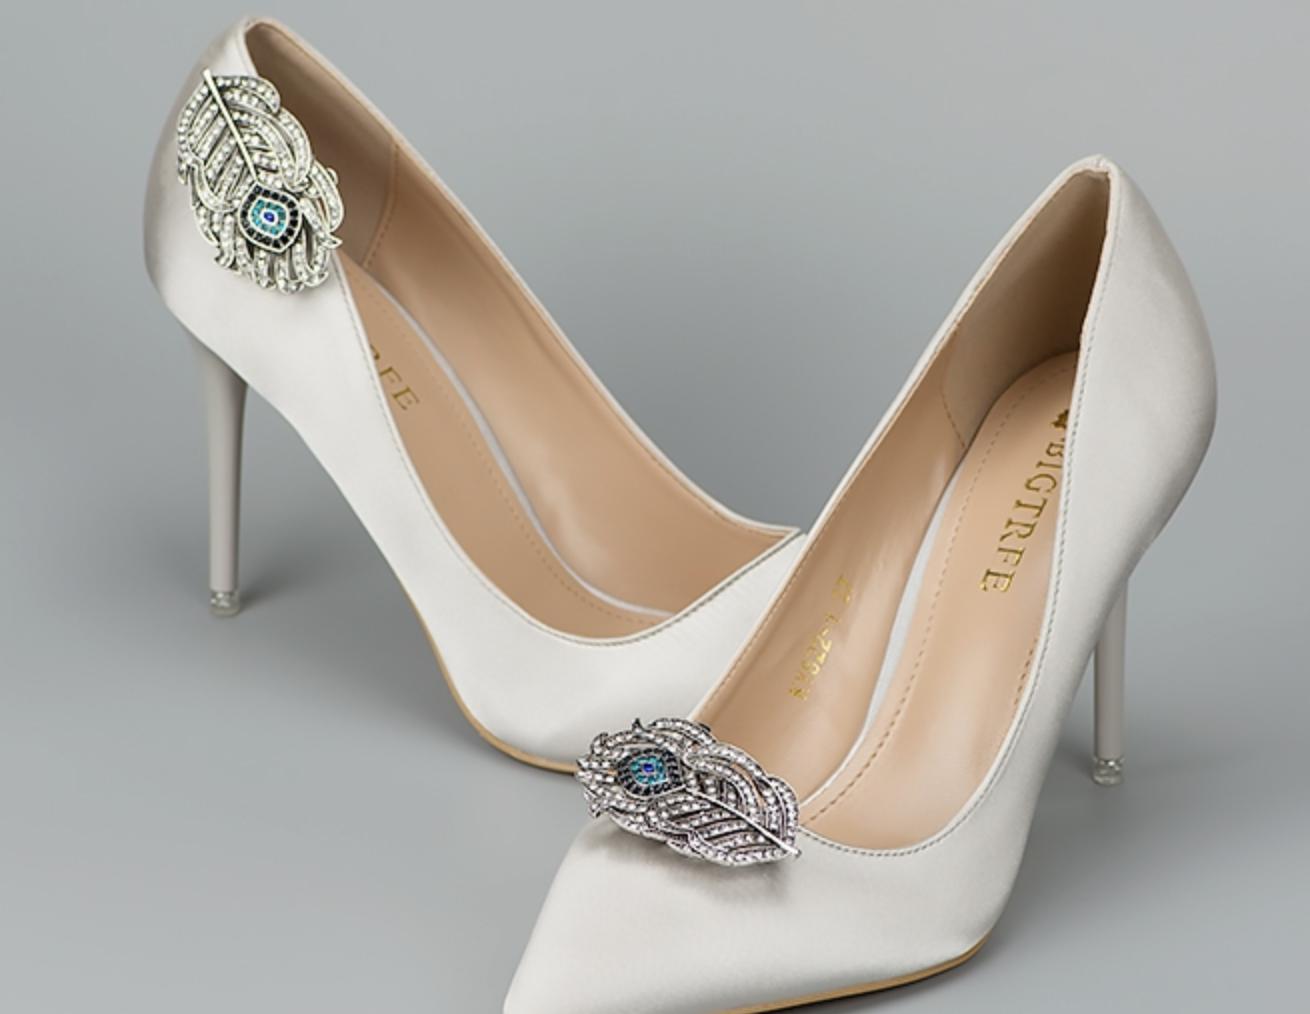 Blue Crystal Wedding Diamante Feather High Heel Shoe Charm Clips Pair